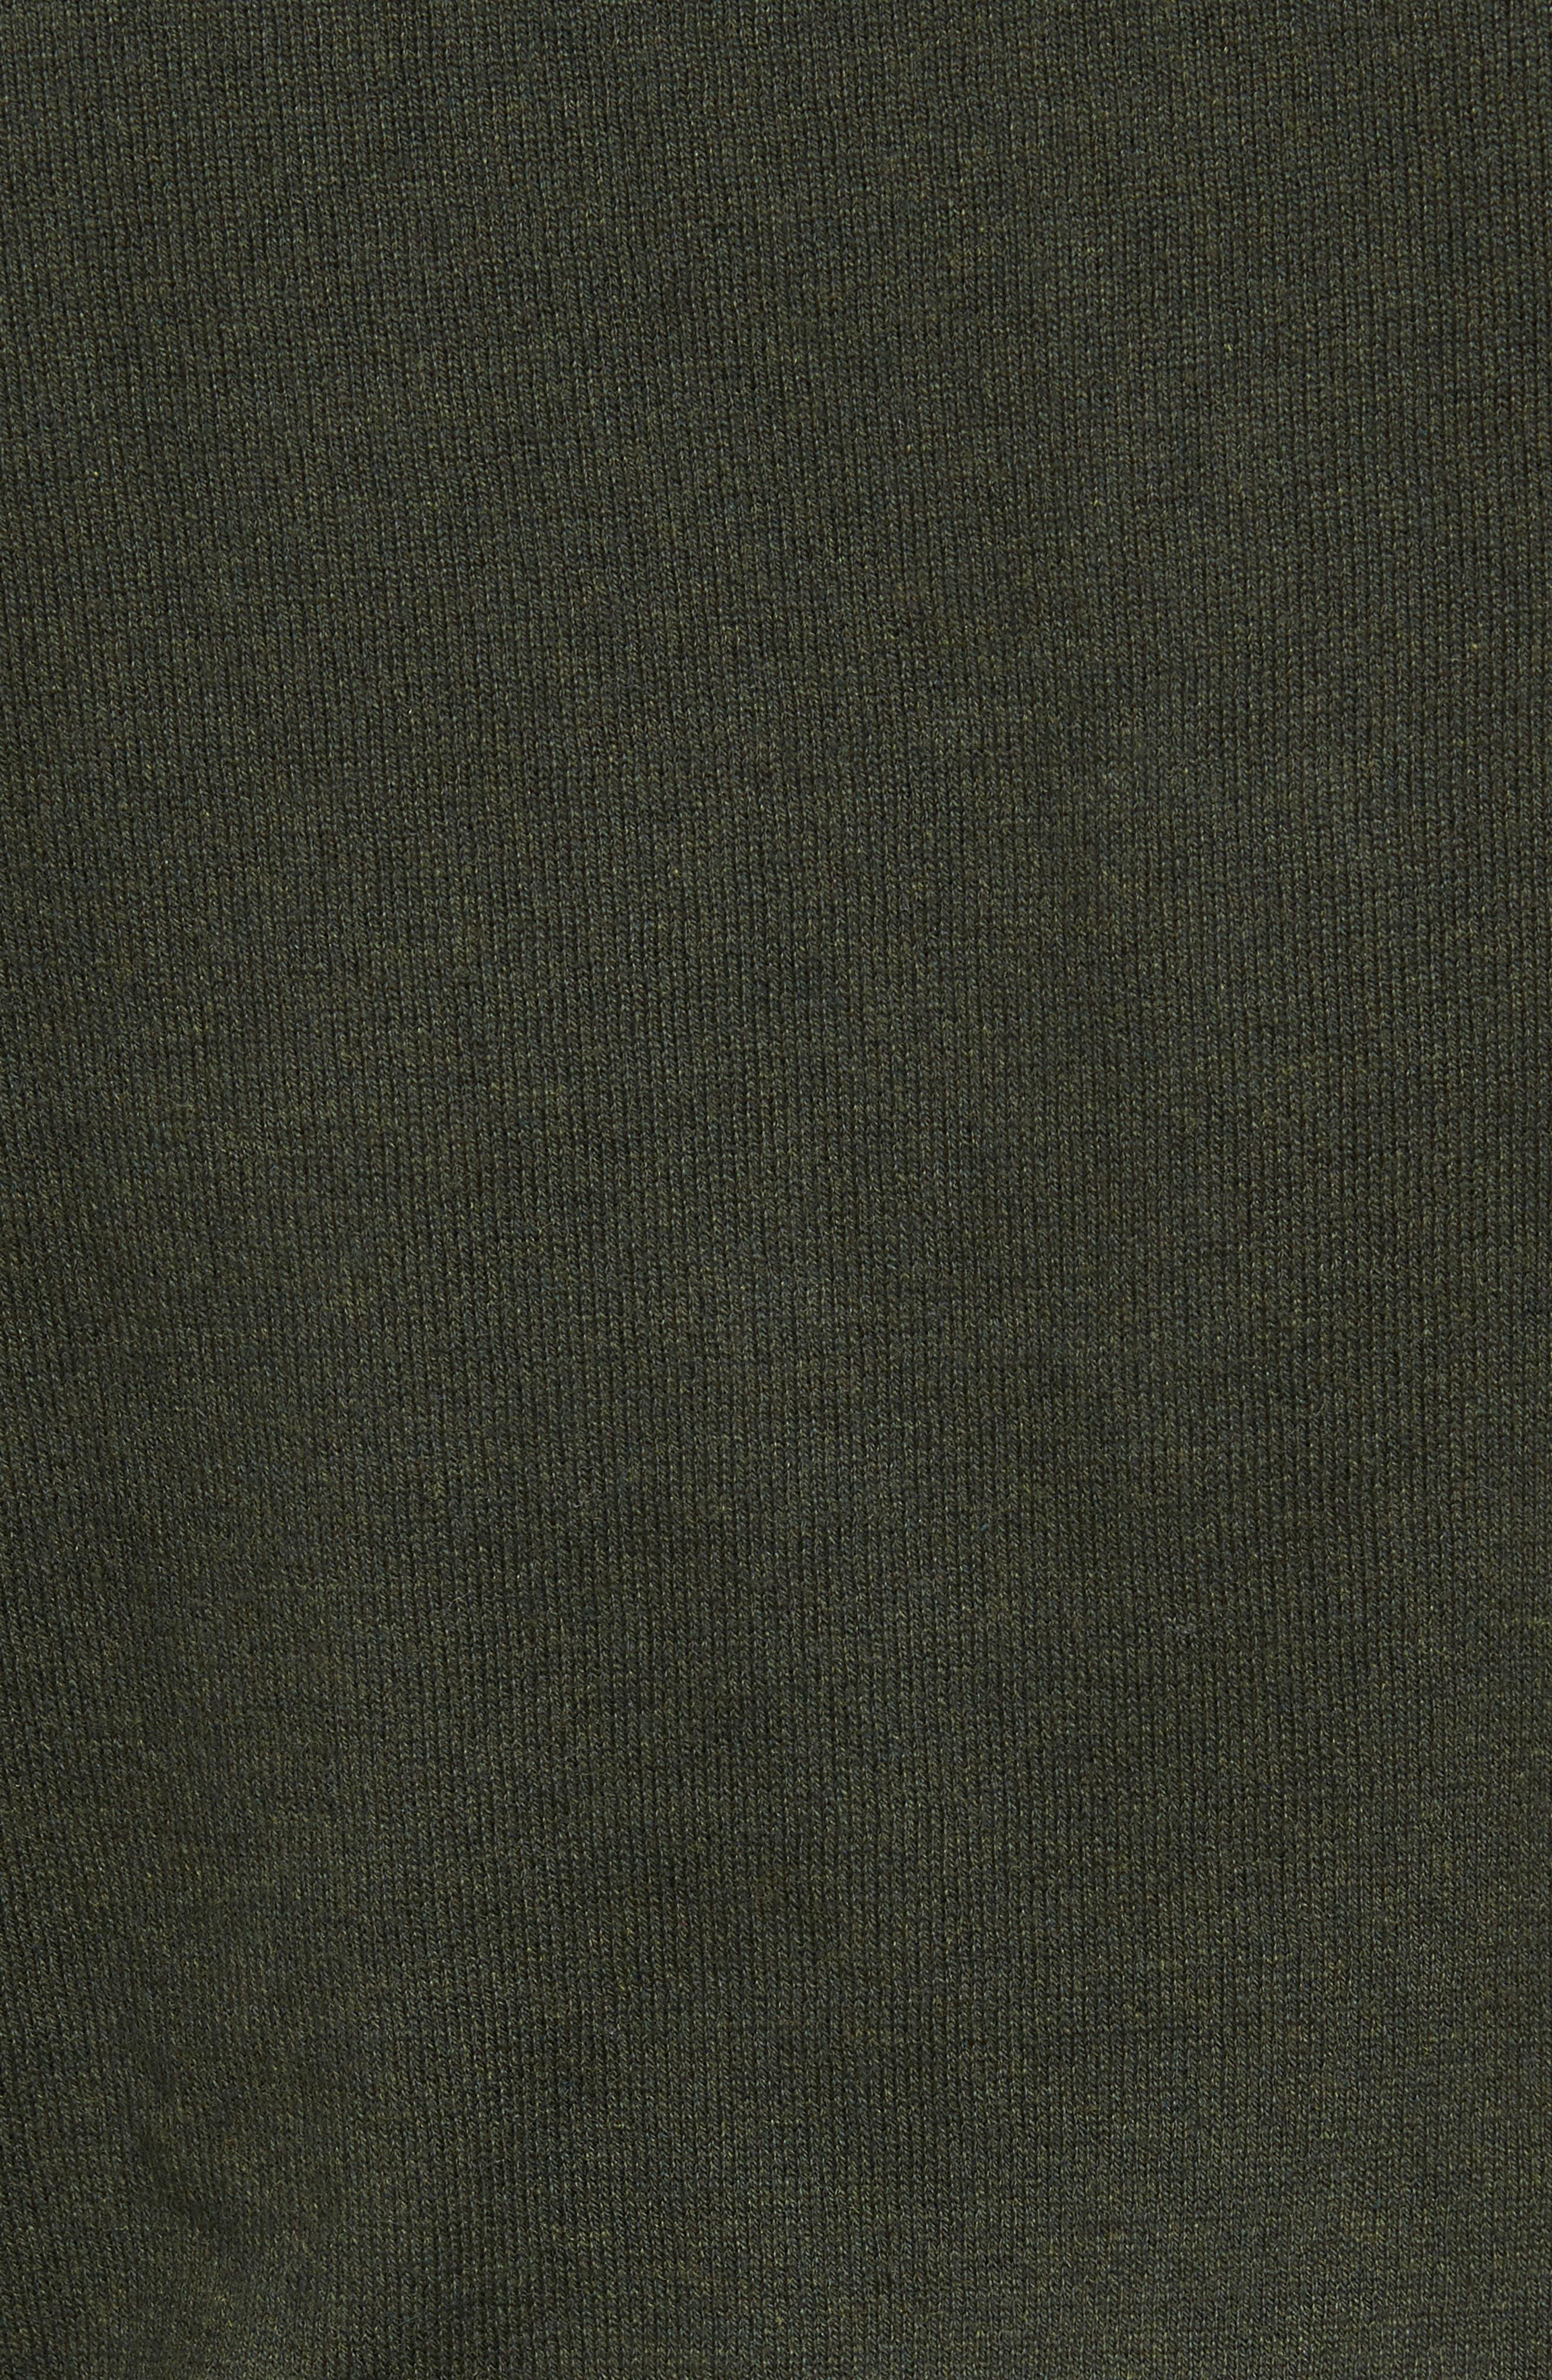 Cotton & Cashmere Crewneck Sweater,                             Alternate thumbnail 5, color,                             Green Deep Pine